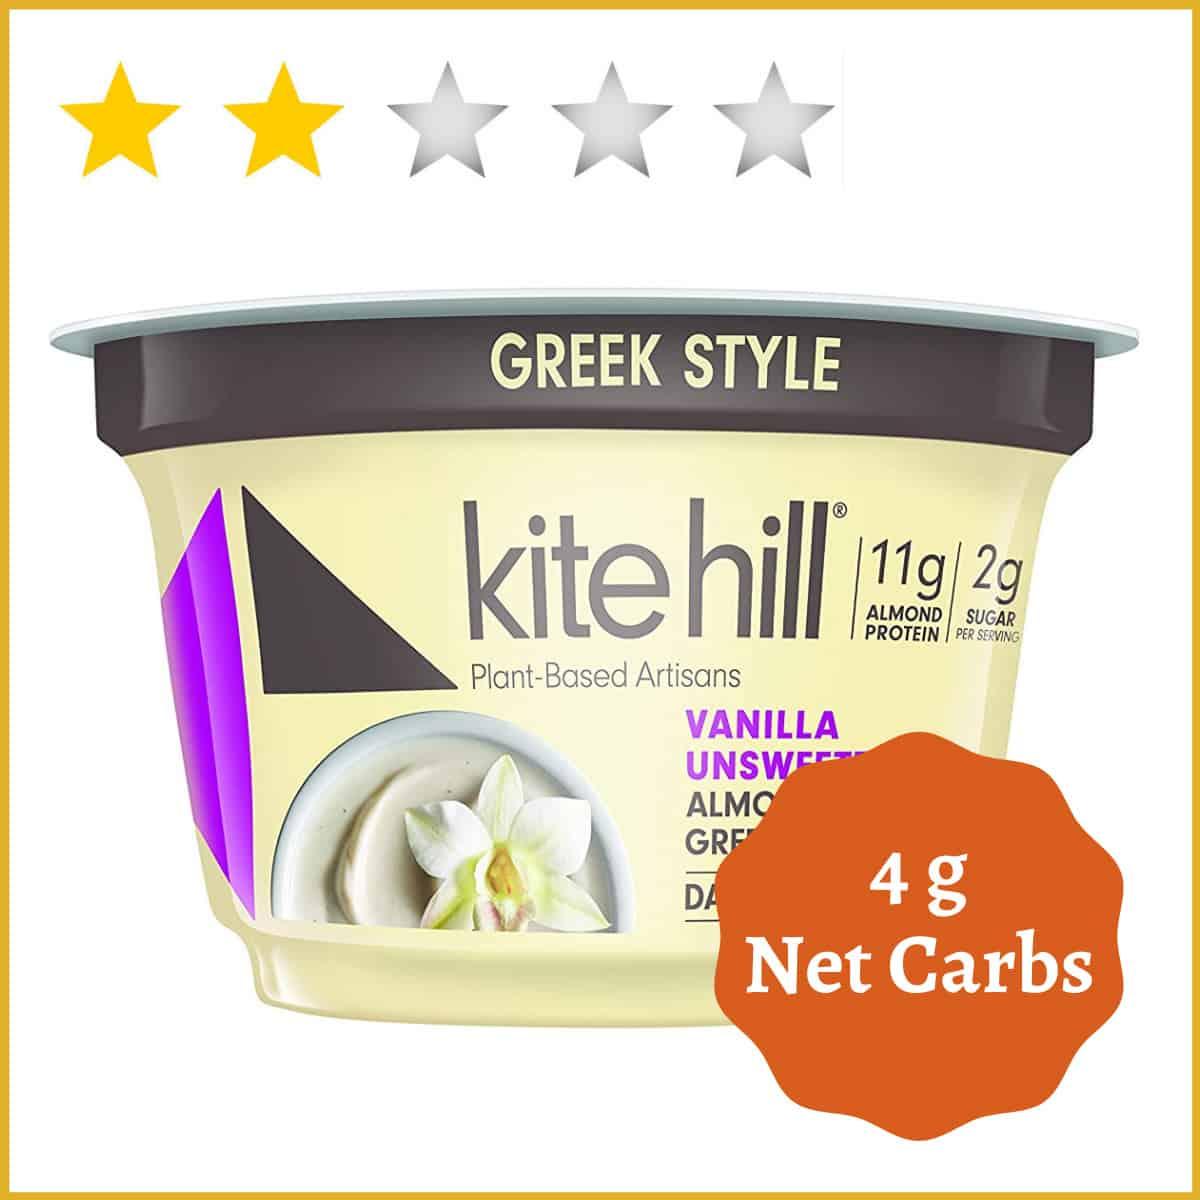 Kite Hill Vanilla Greek Style Almond Milk Yogurt